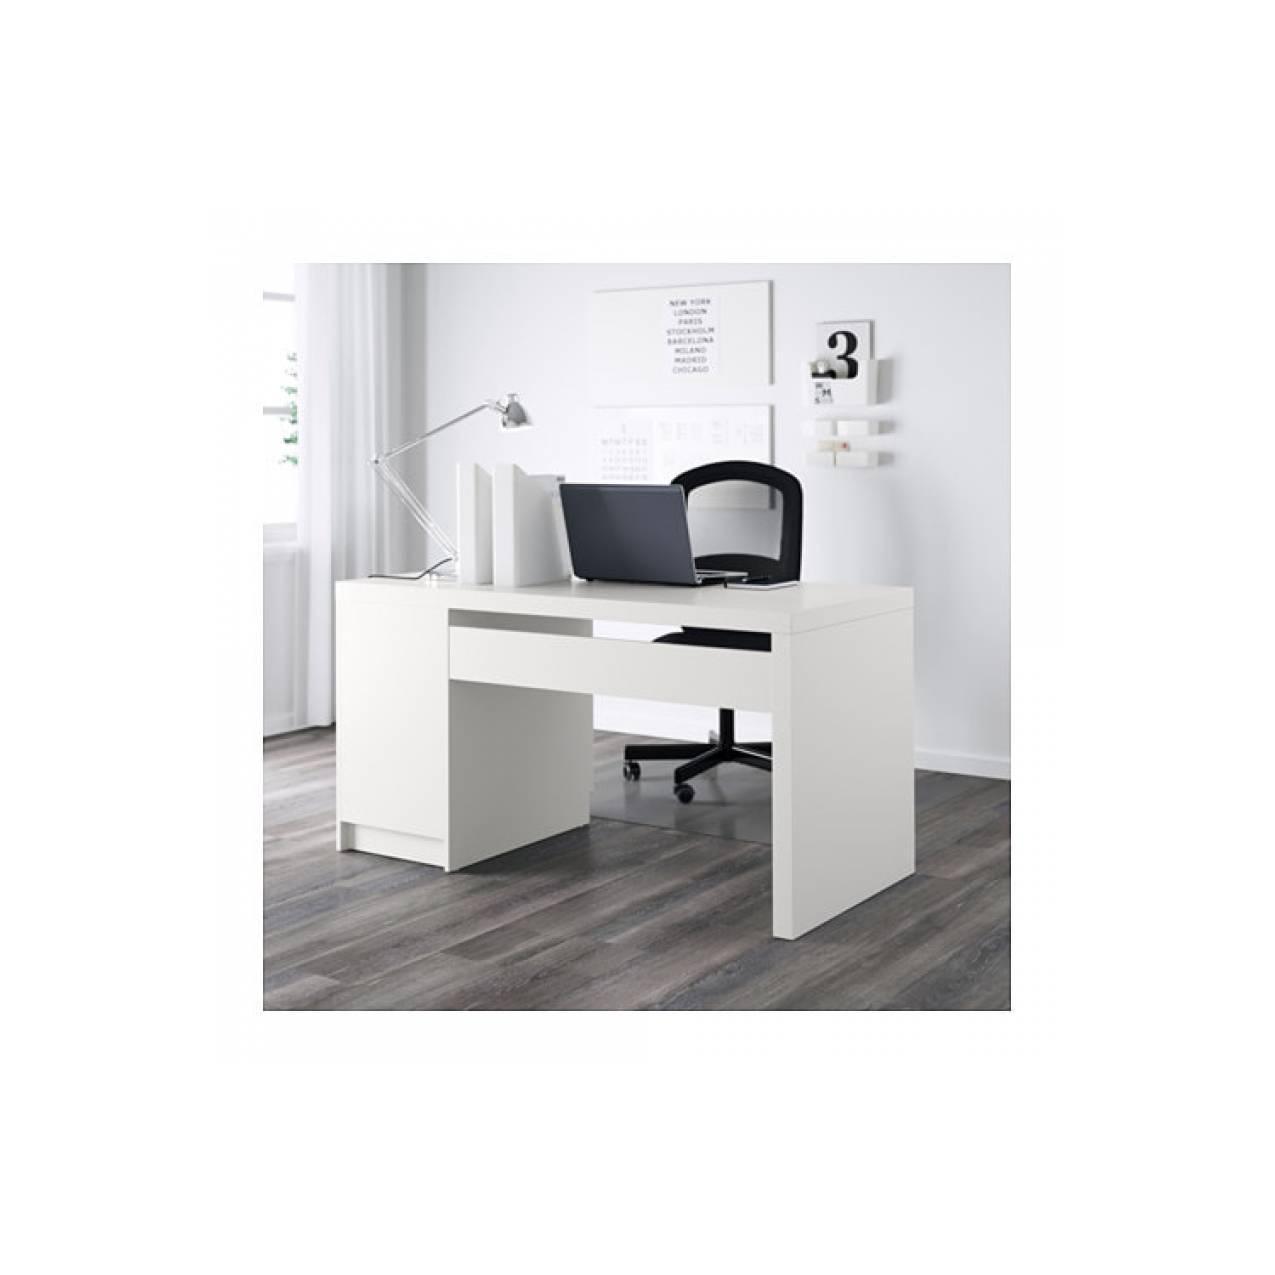 IKEA MALM Meja kerja / kantor / komputer, putih, 140x65 cm